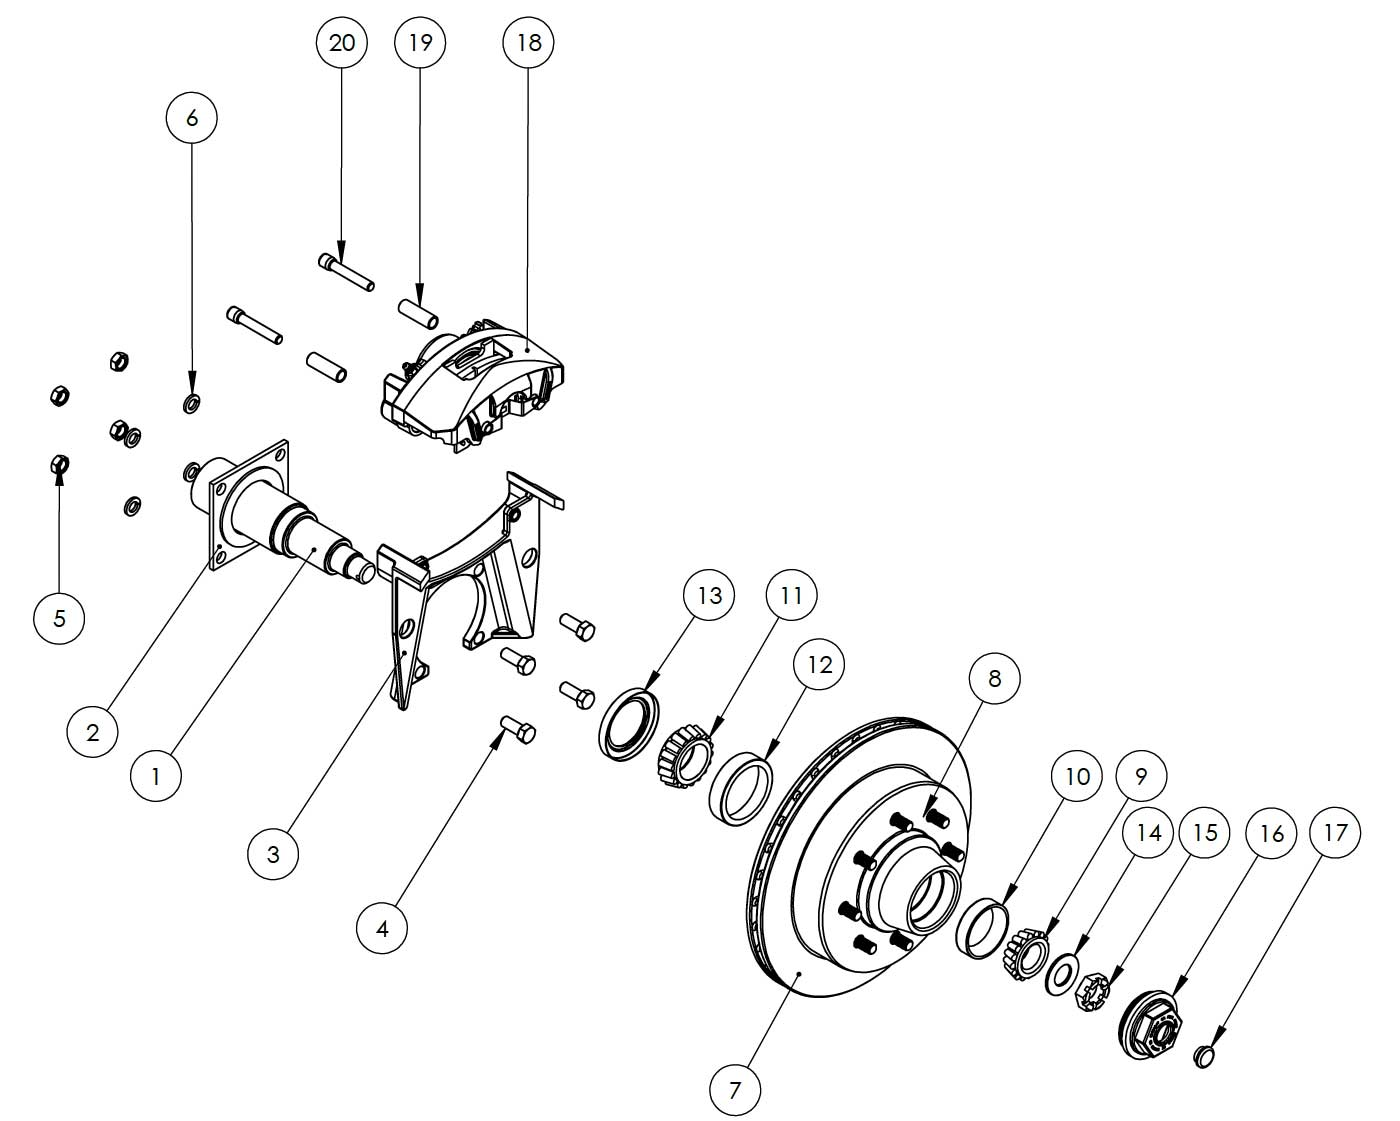 Kodiak 8k 13 inch integral hubrotor disc brake kits and replacement kodiak 8k 13 inch hubrotor integral disc brake parts illustration for al ko publicscrutiny Gallery